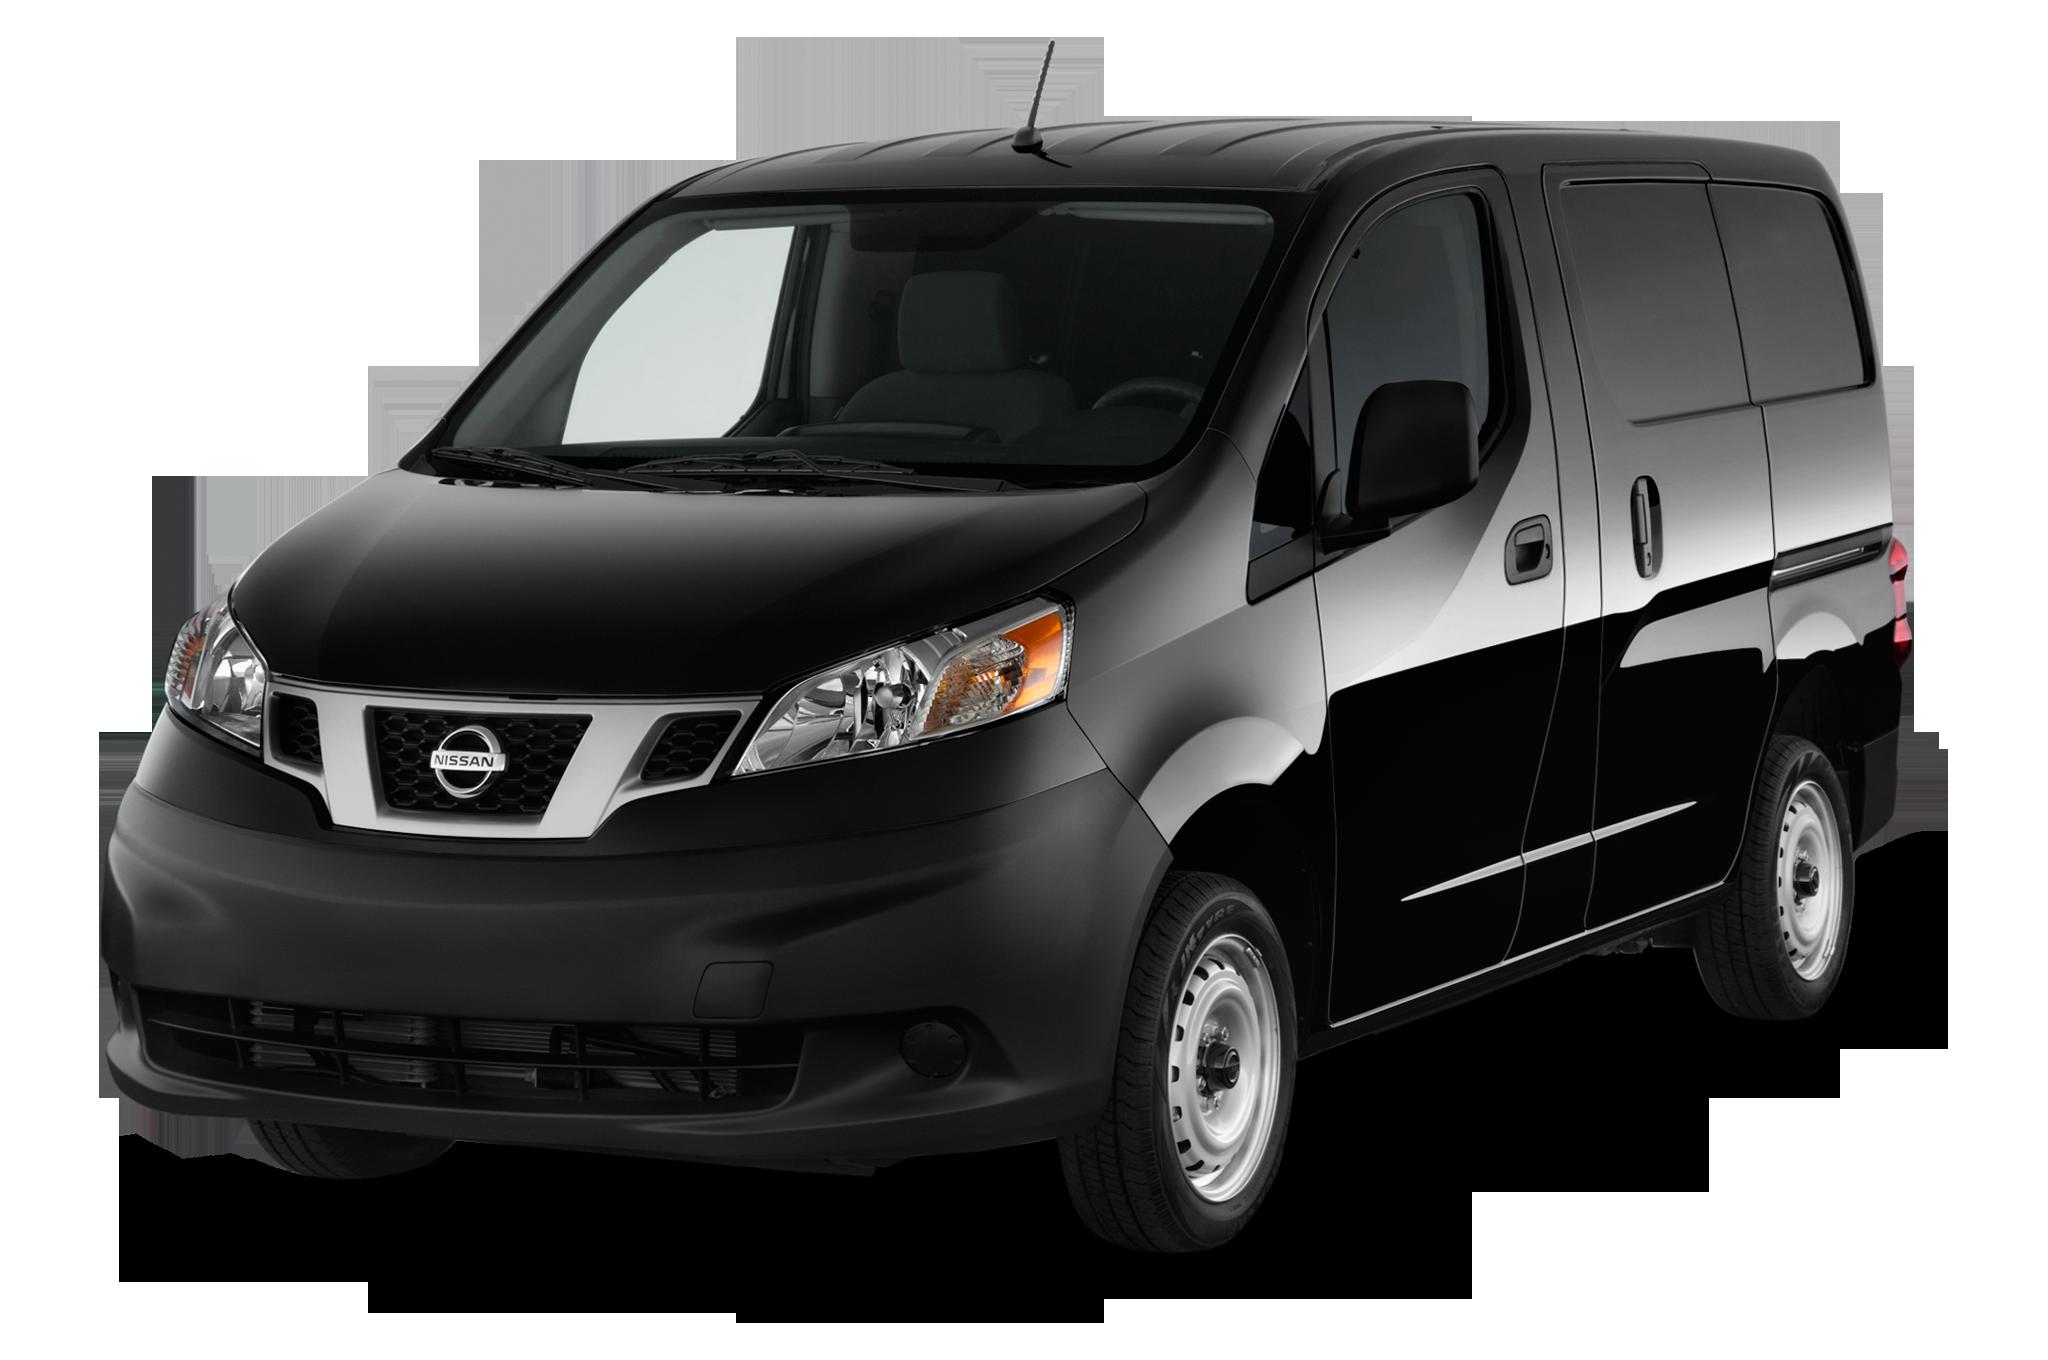 Nissan NV200 (or similar)